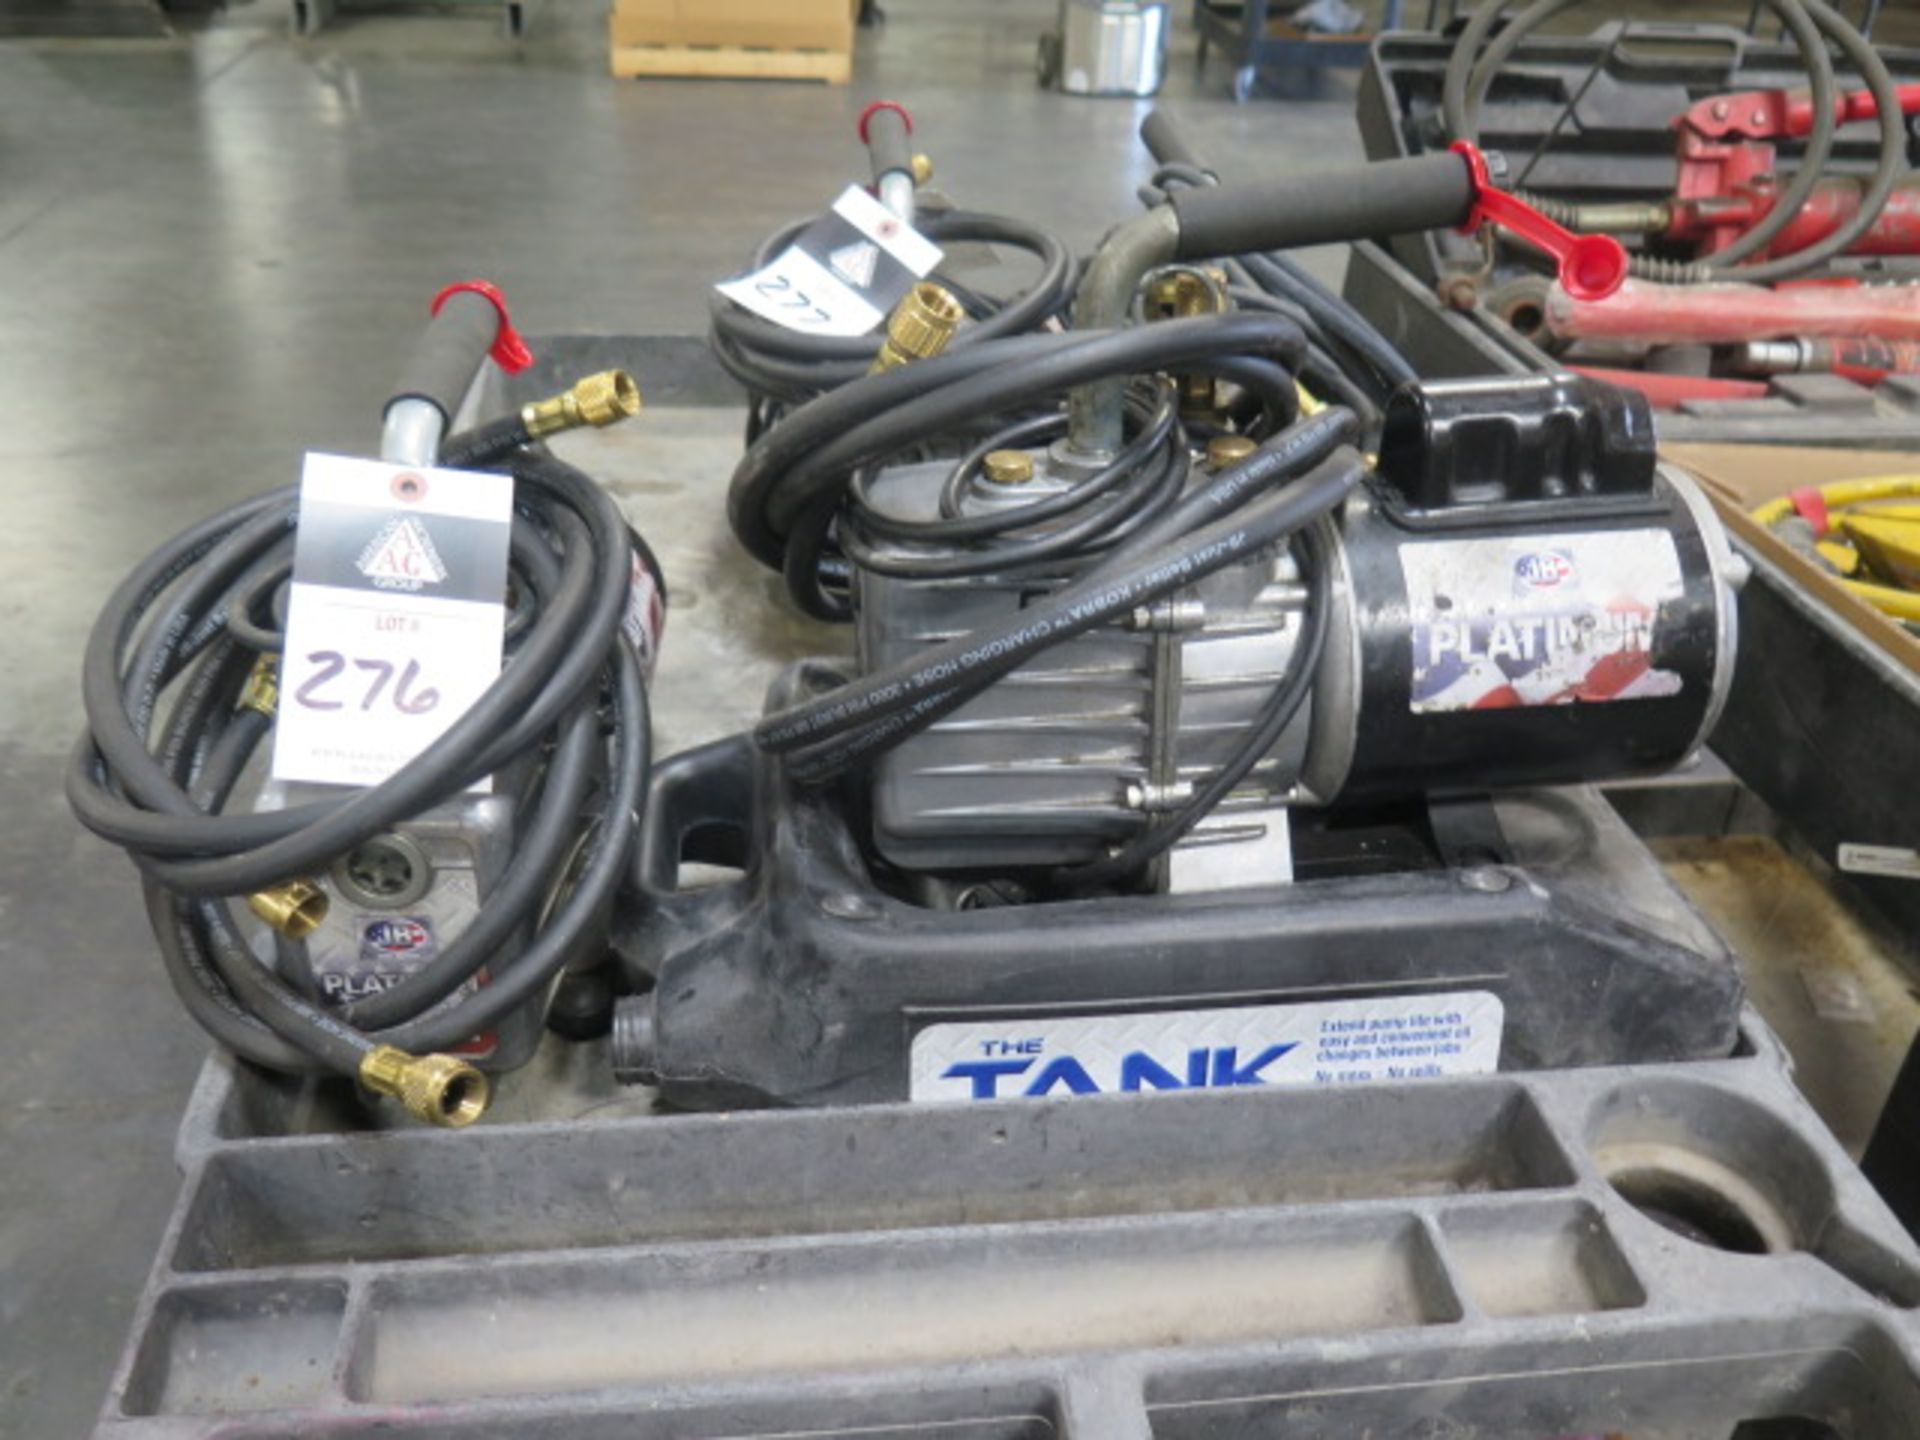 JB Platinum Vacuum Pumps (2) (SOLD AS-IS - NO WARRANTY)